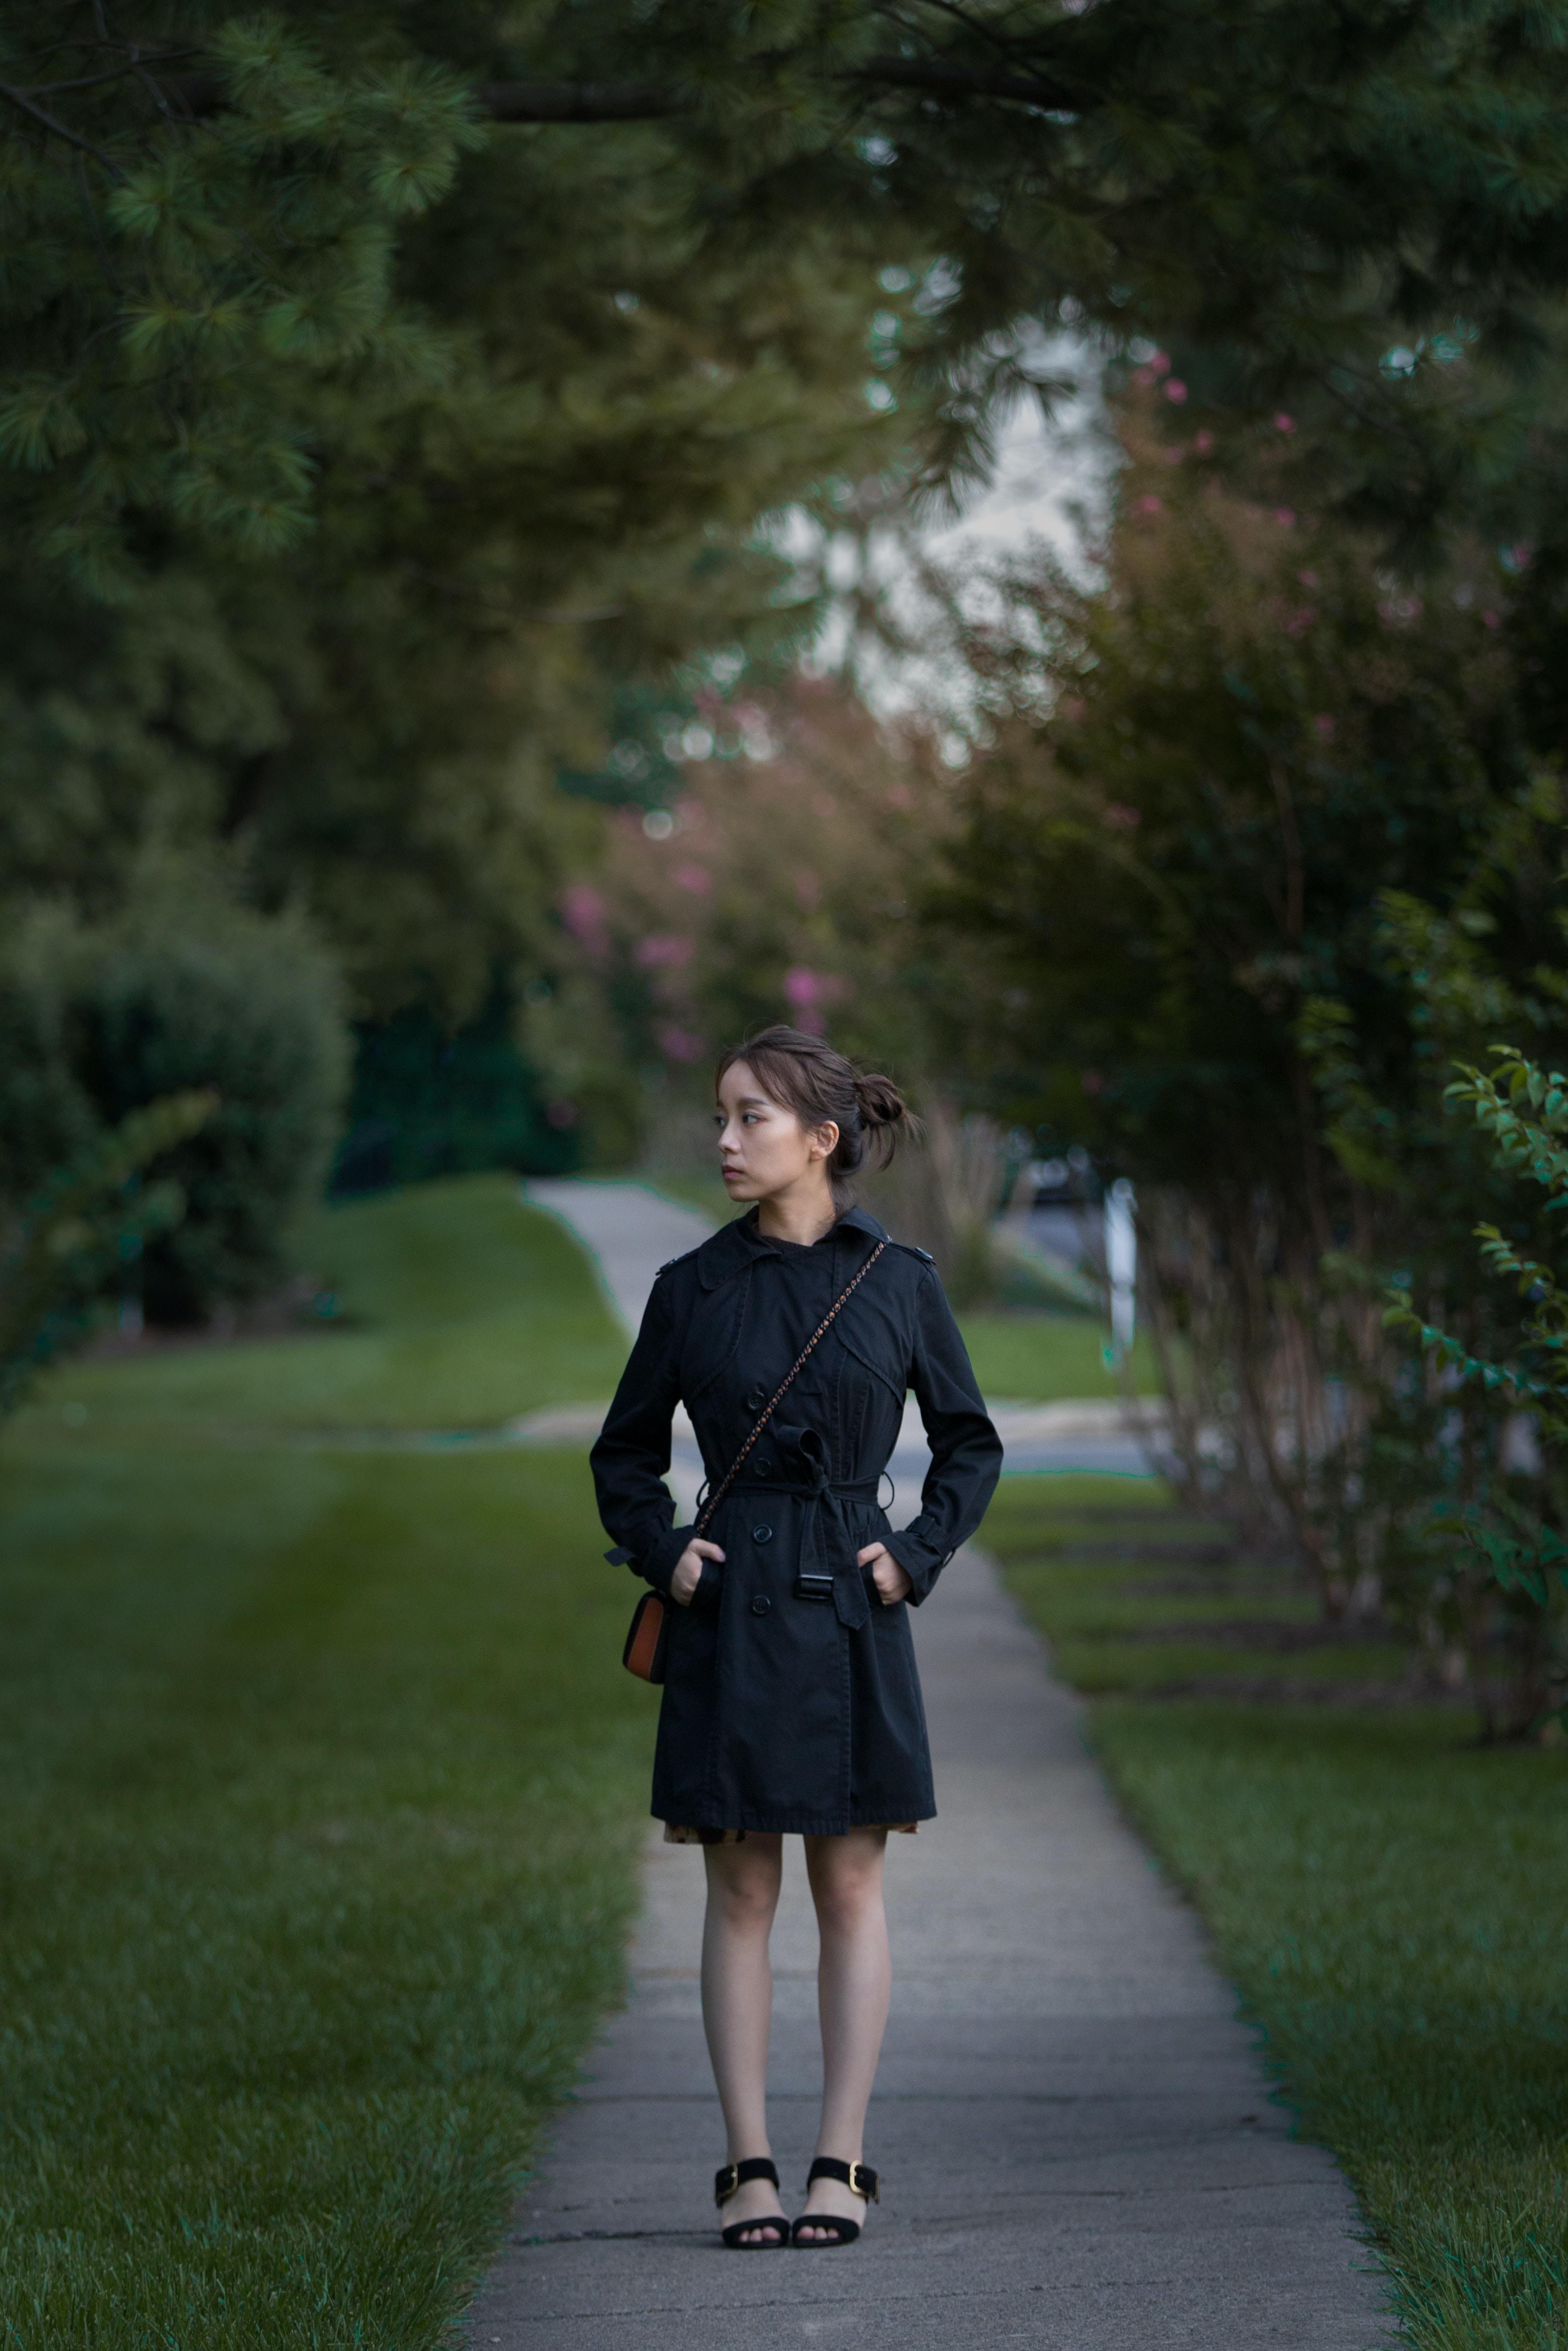 women's black dress shirt standing on pathway